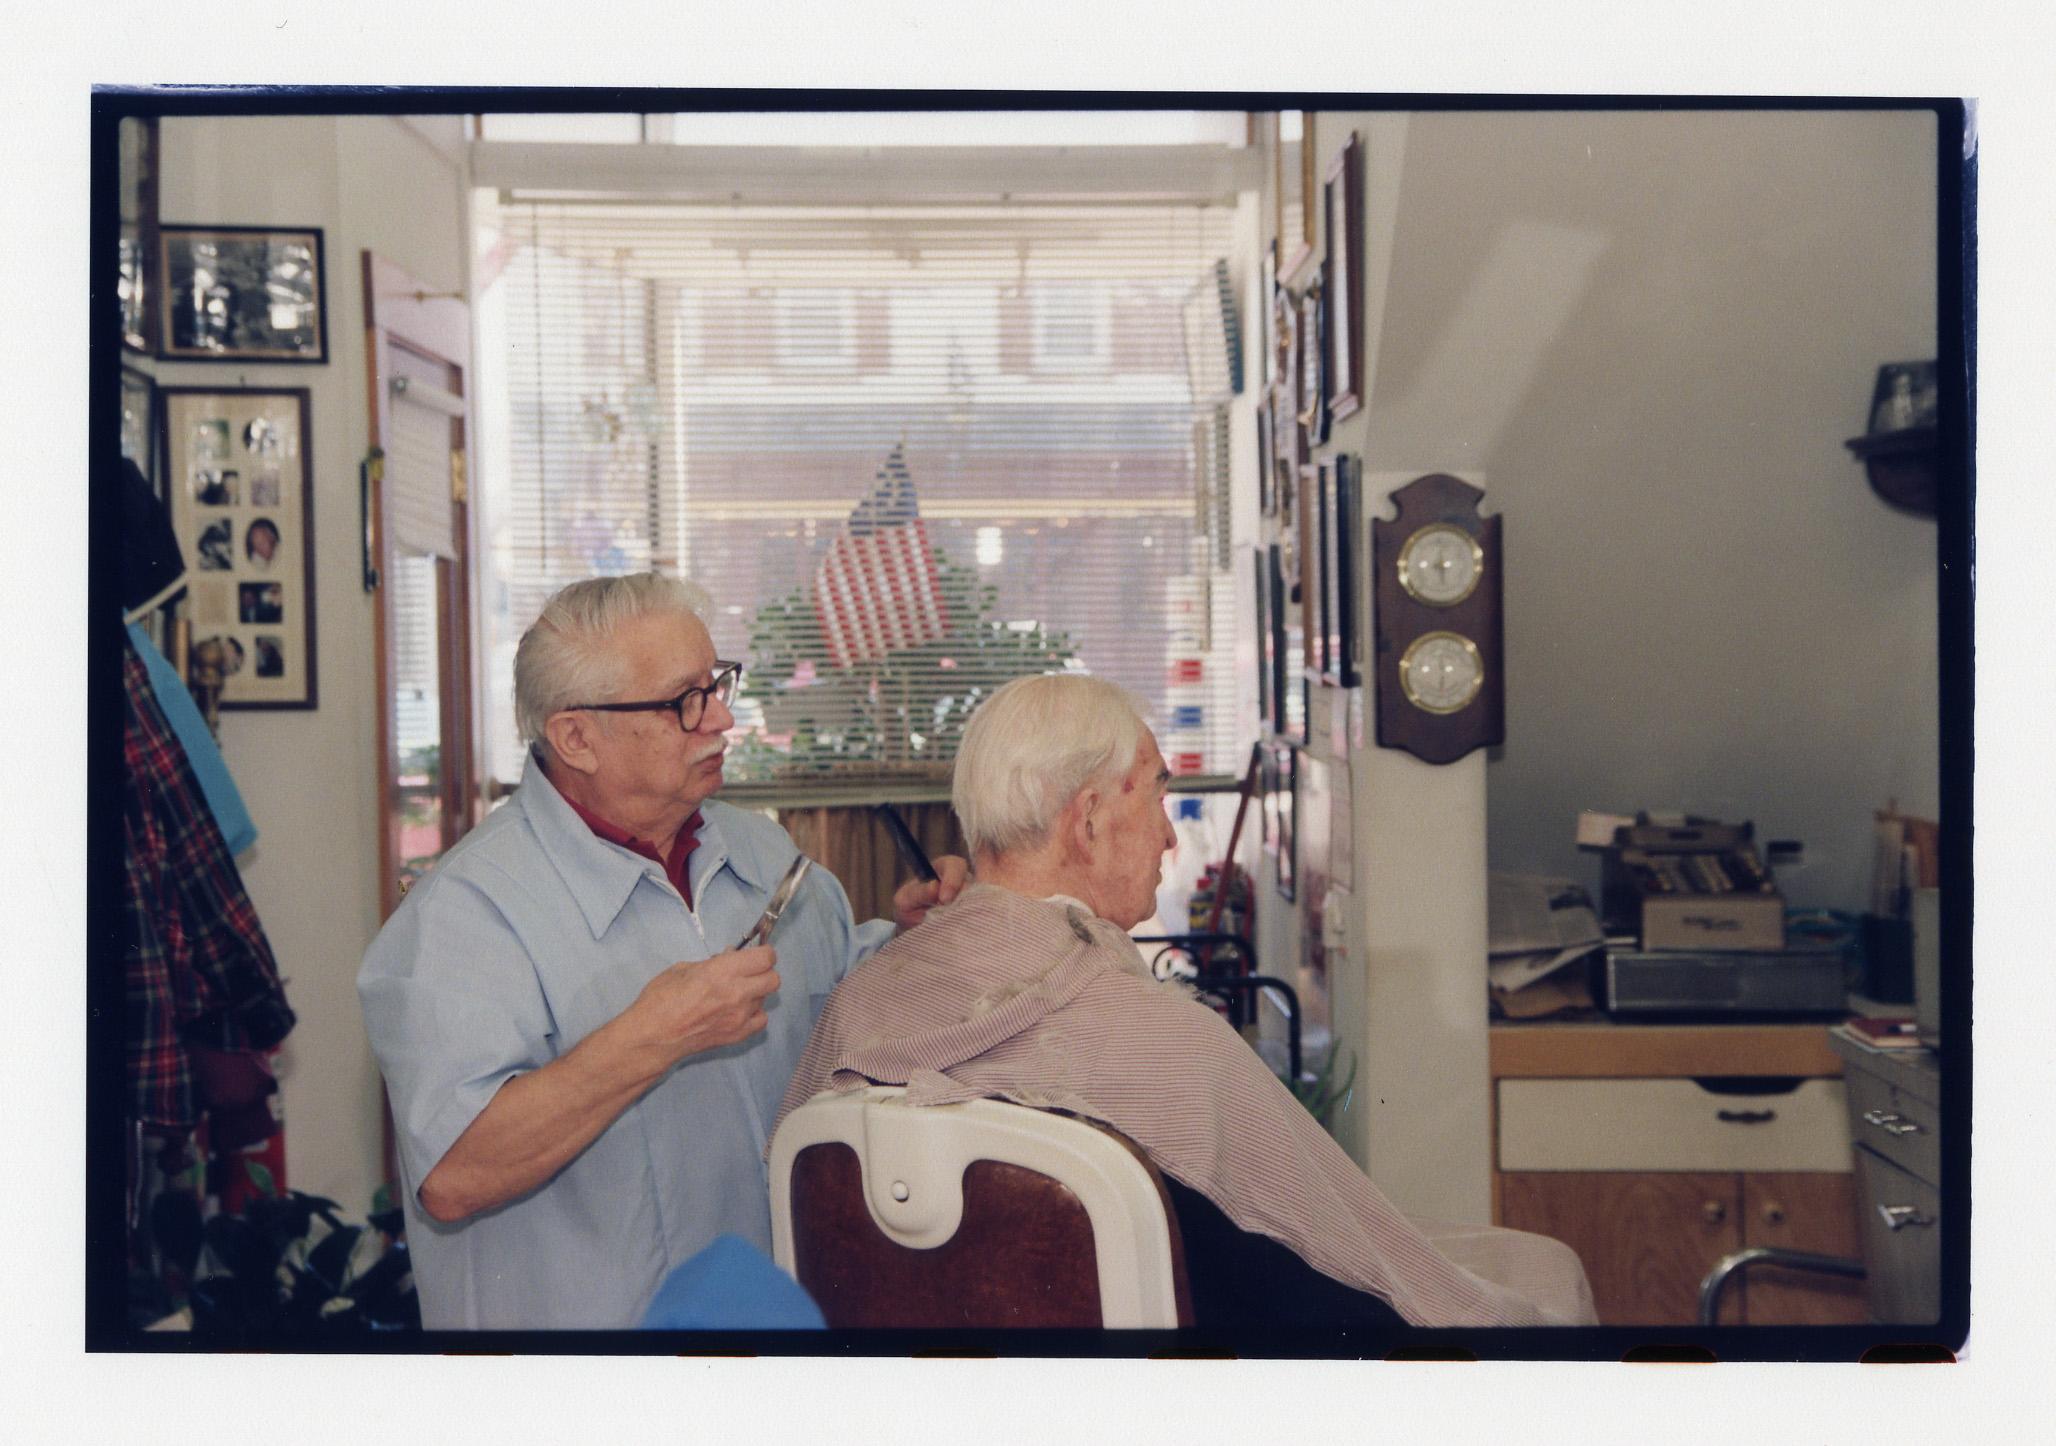 Marty Trunzo the Barber - Kathryn Szoka